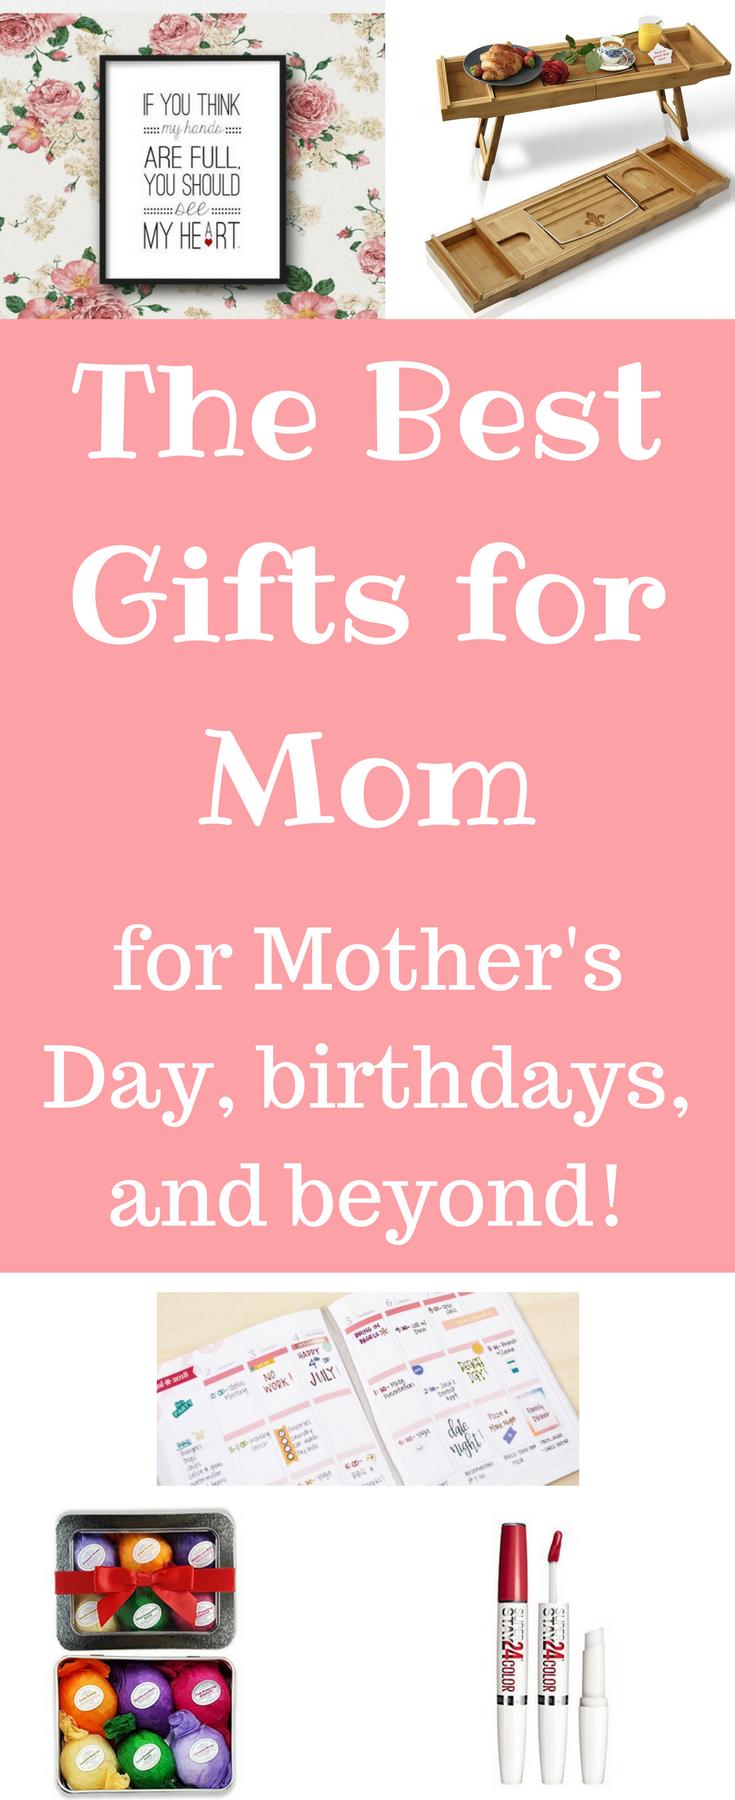 Mother's Day / Mother's Day Gift Ideas / Mother's day gifts / Gifts for Mother's Day / Gift ideas for Mom / Mom gift ideas / Mom gifts via @clarkscondensed